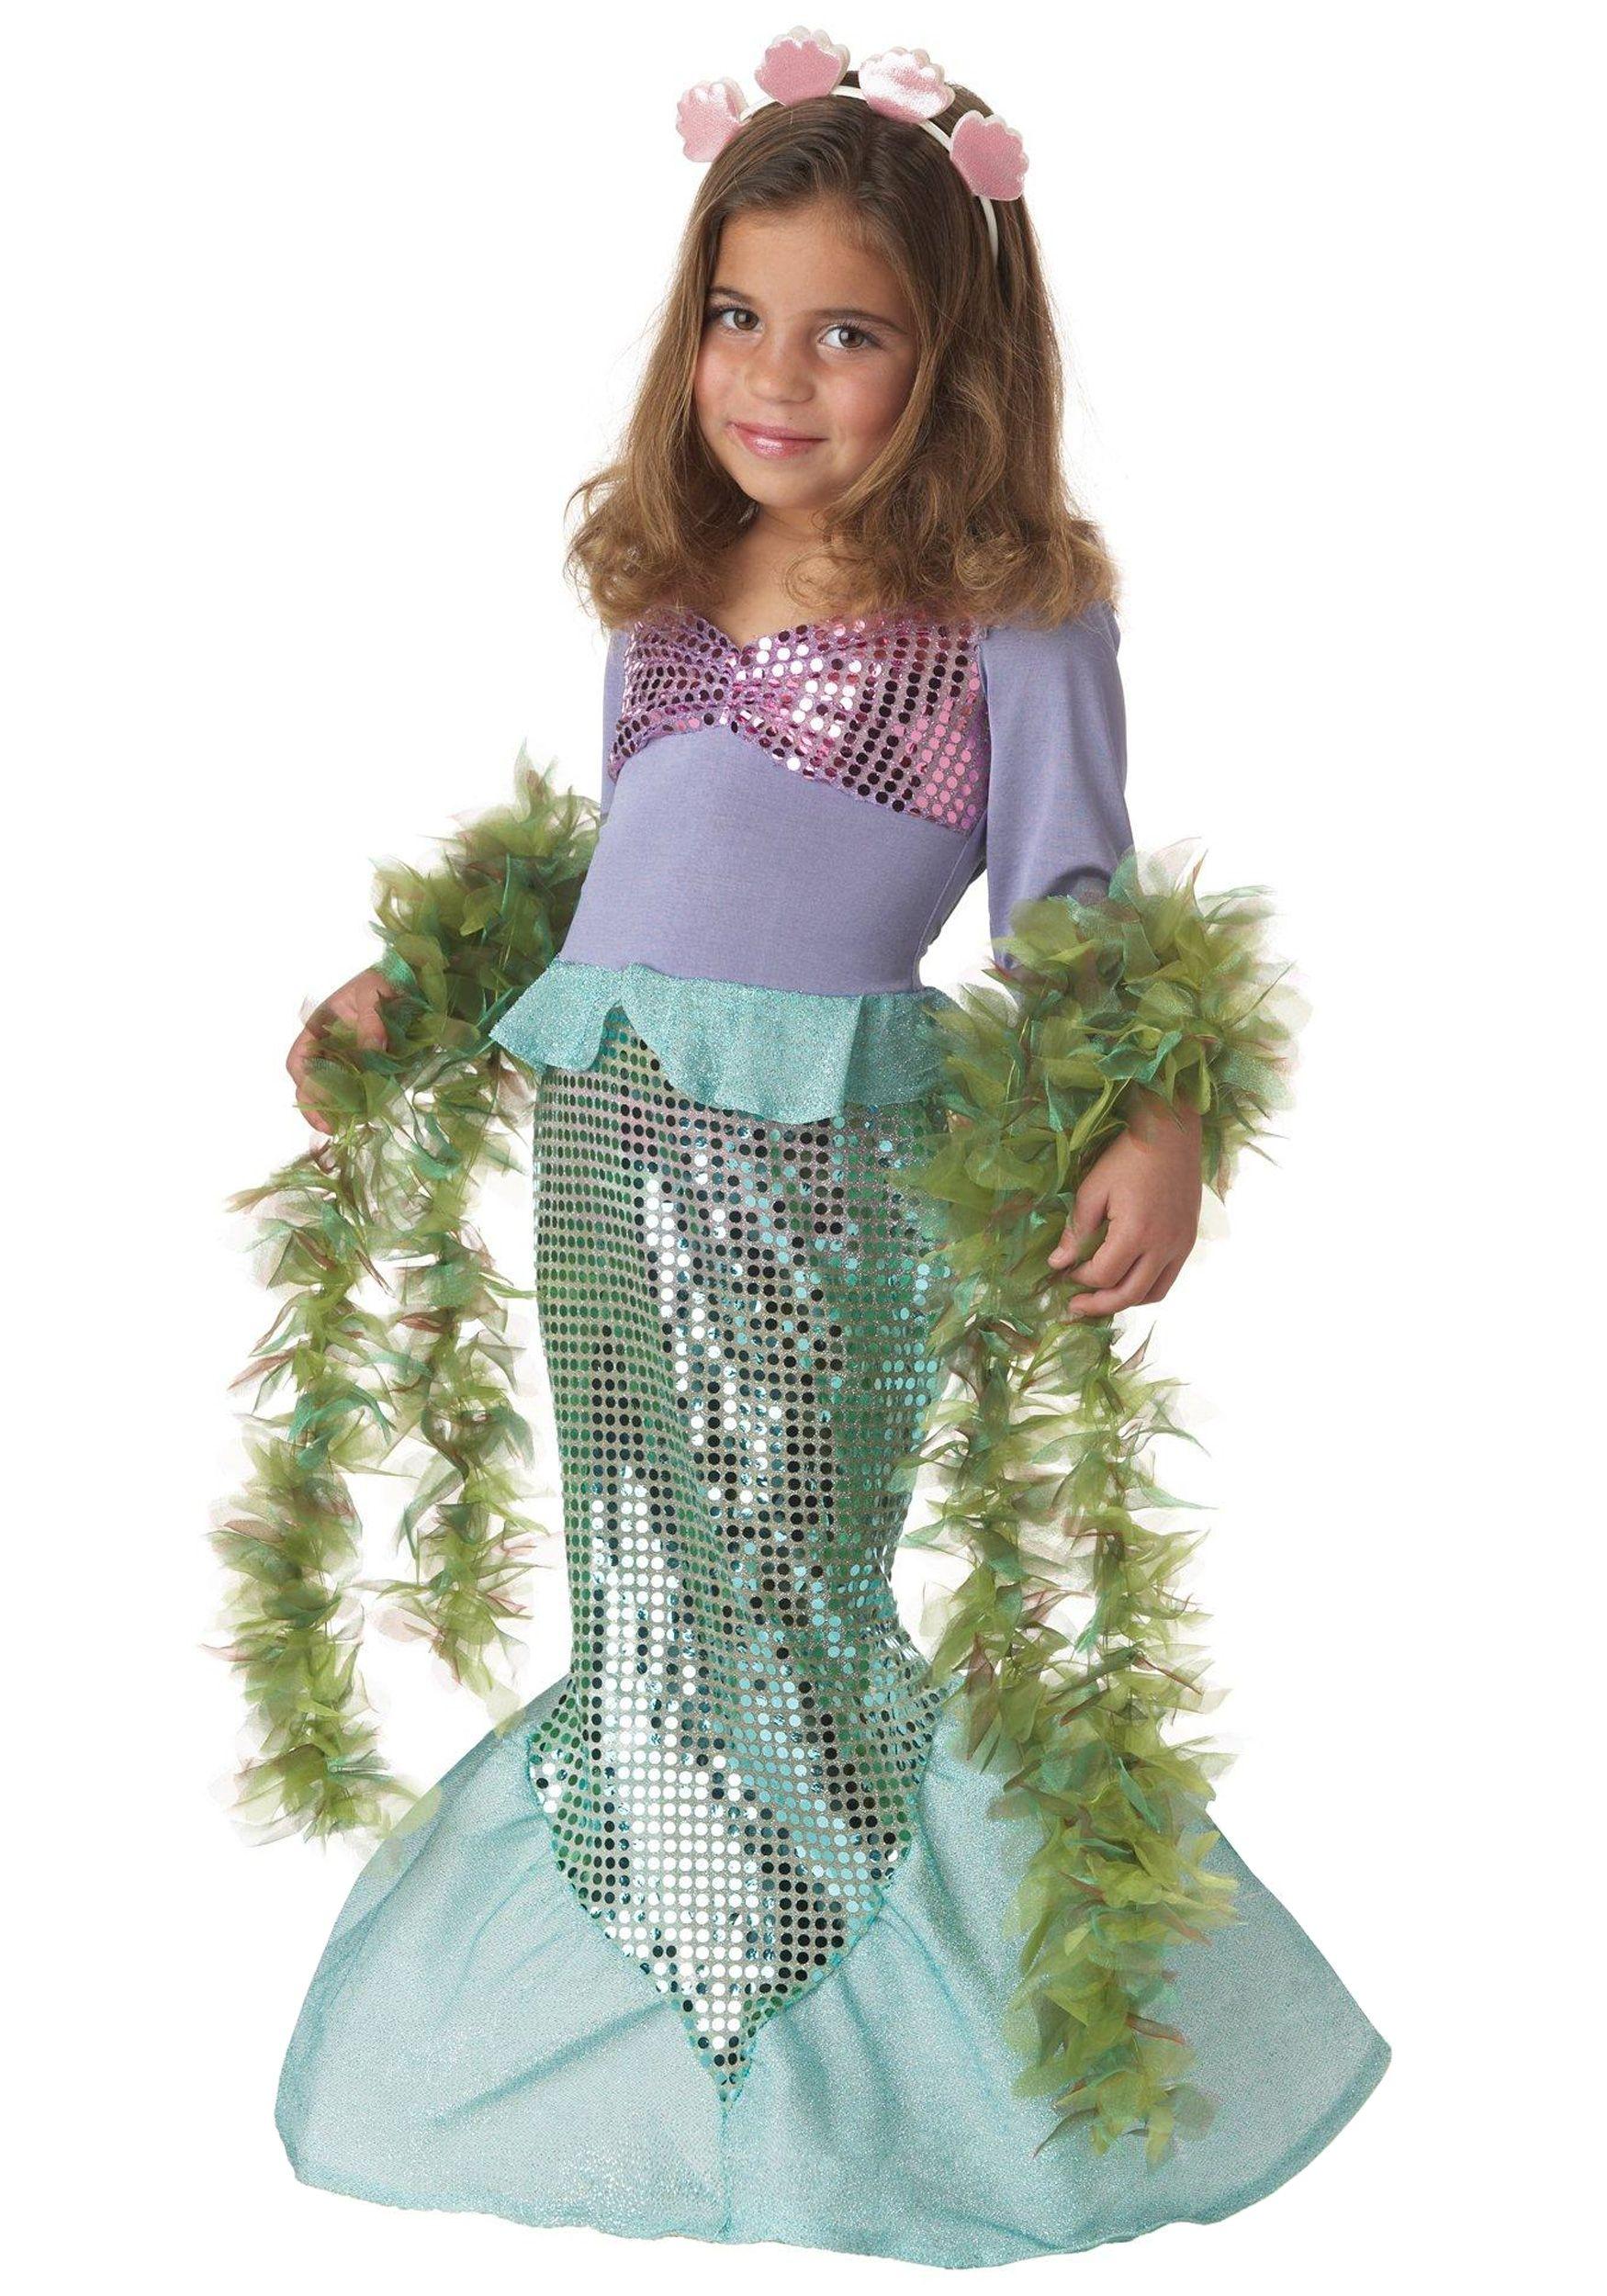 explore mermaid halloween costumes and more - Baby Cow Costume Halloween